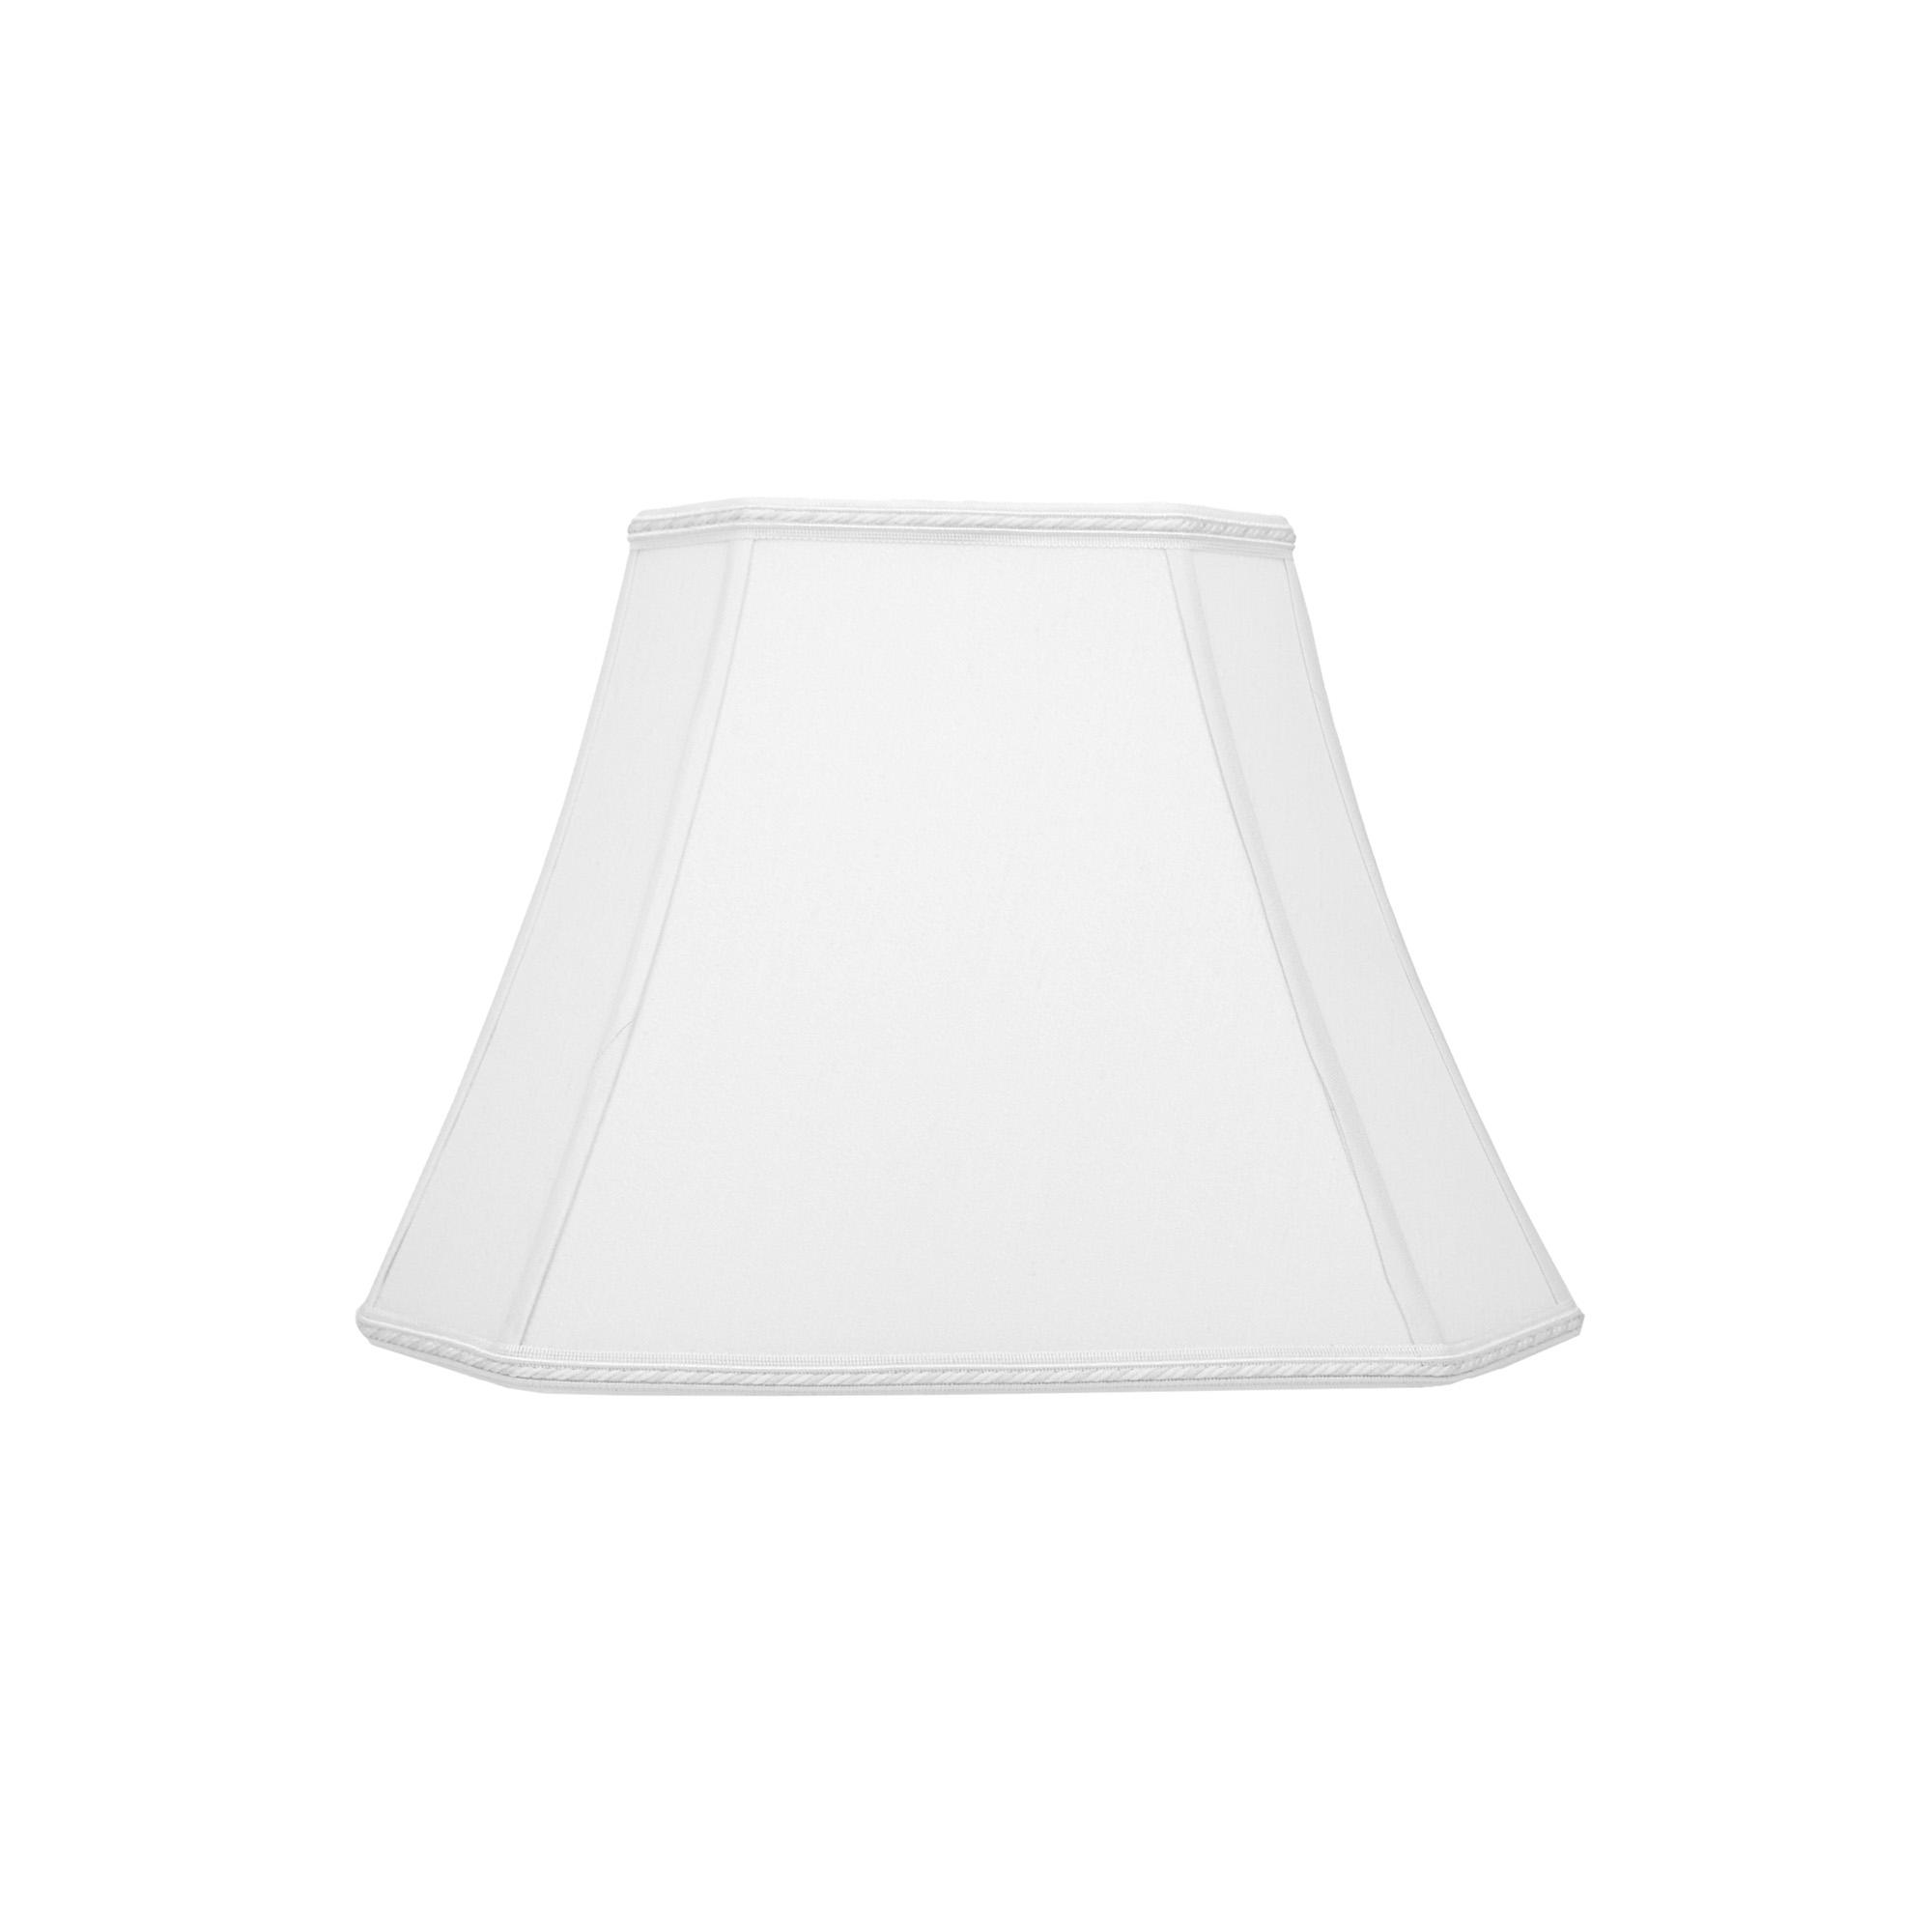 Lamp Shade1-01-13 White.jpg